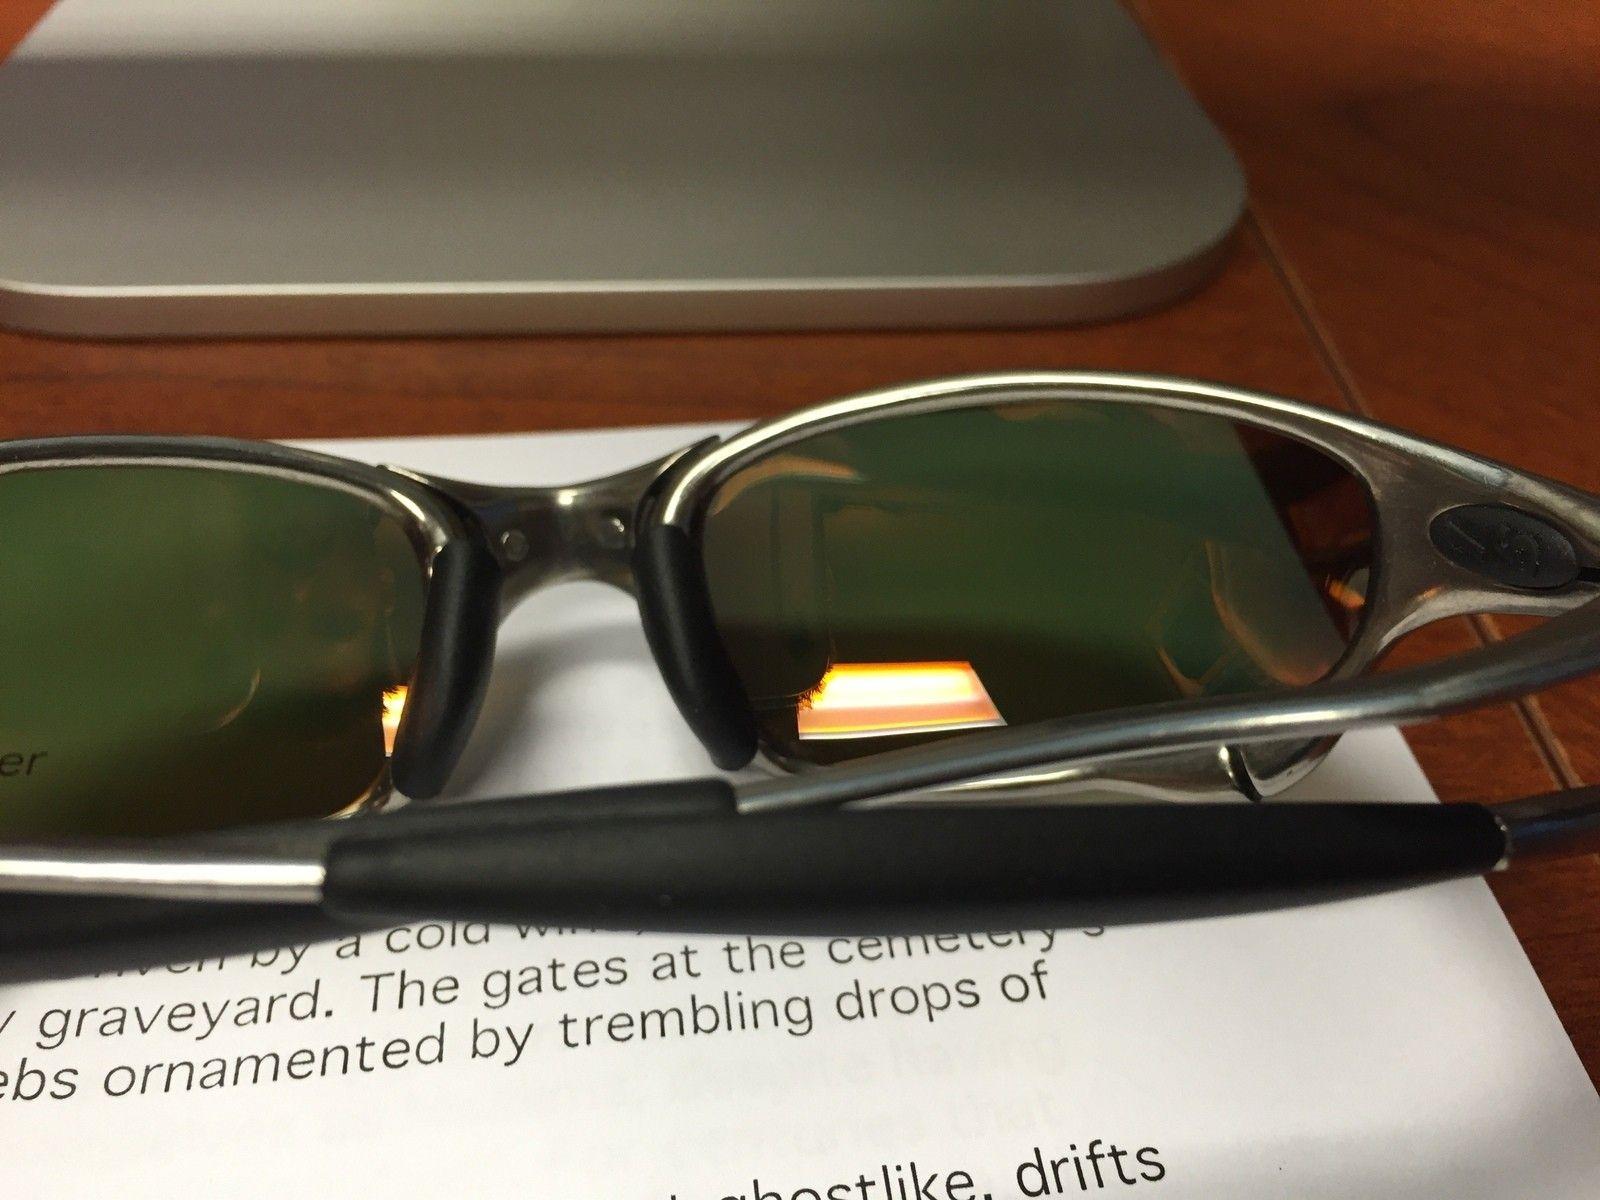 Question about Fire Iridium Polarized Lenses - image.jpeg